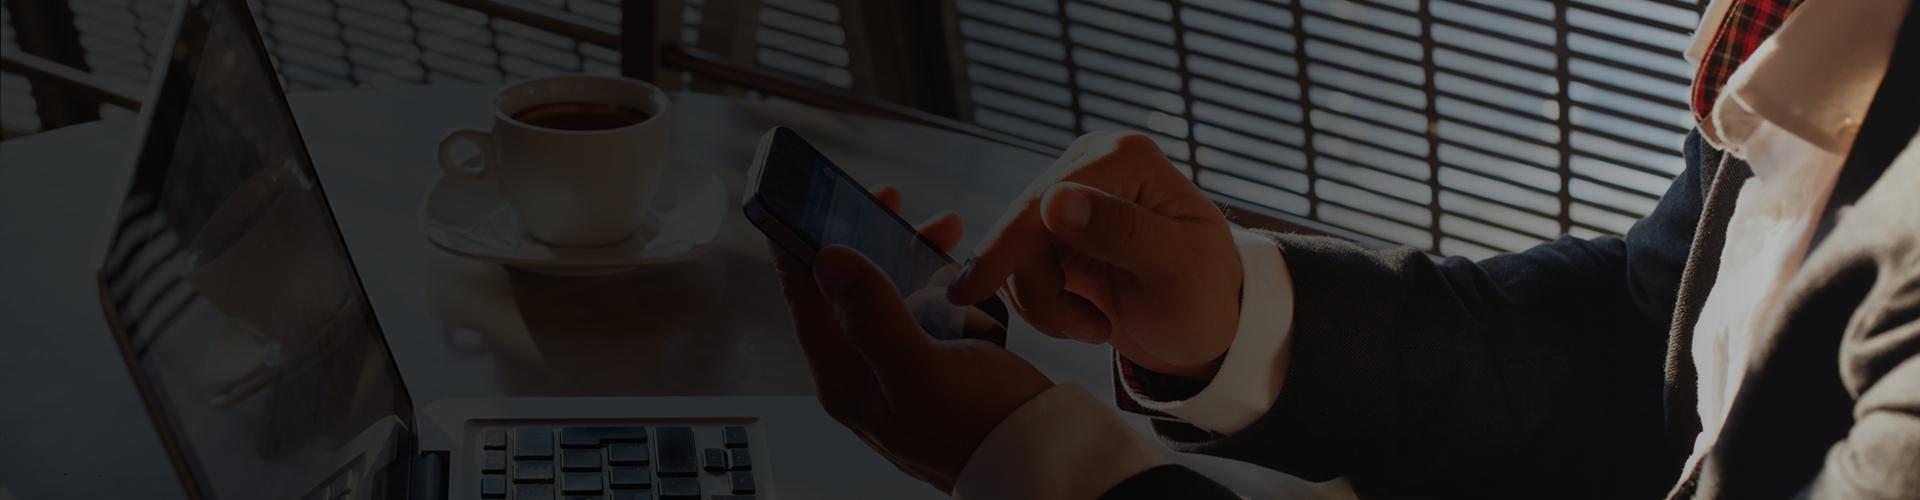 mobile_operators_banner_2020_v2